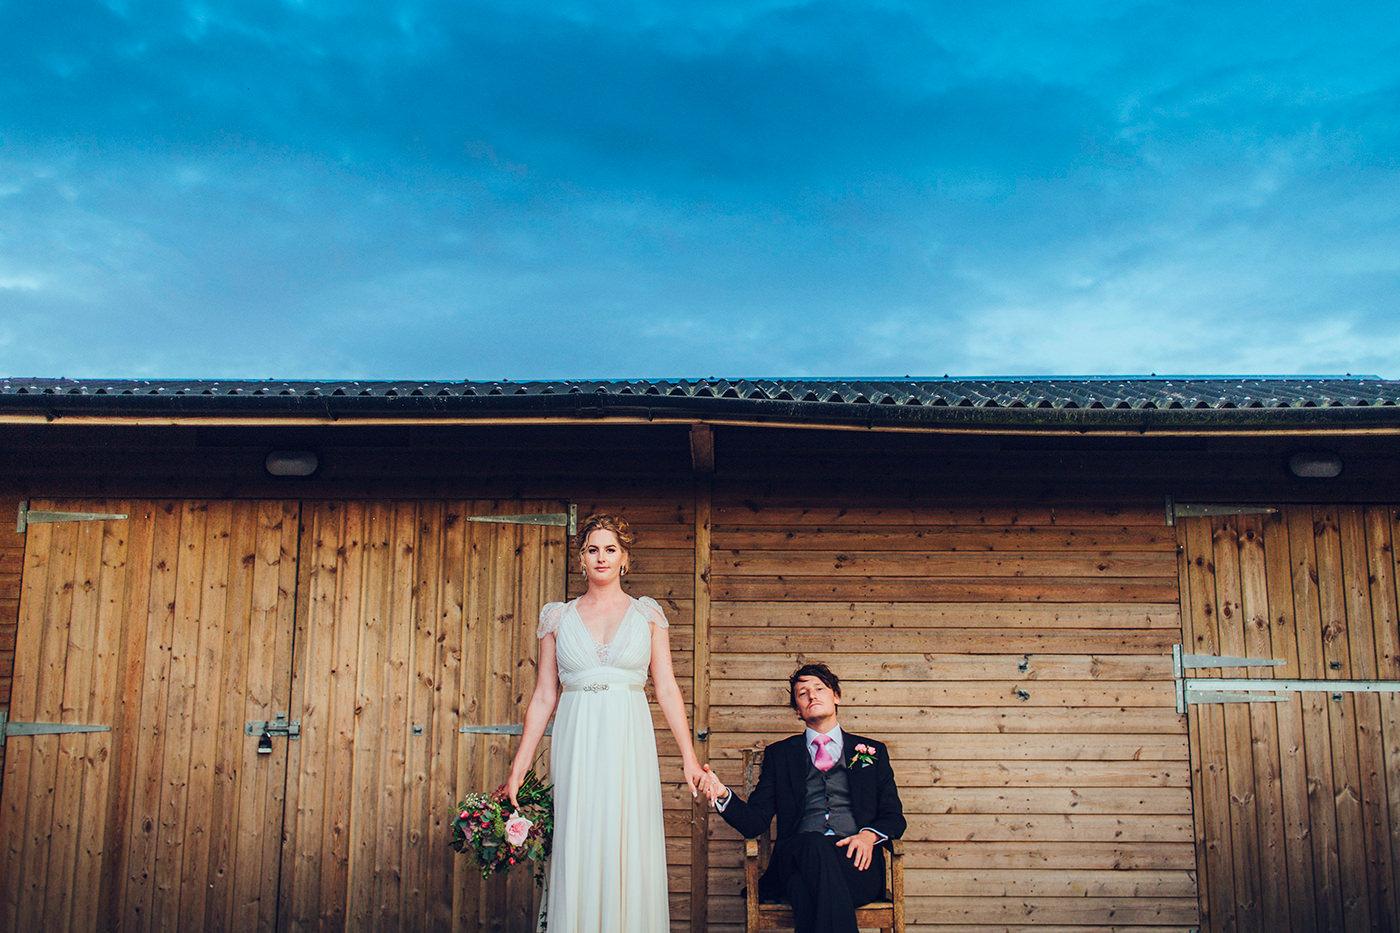 Alternative bride and groom portrait by Steve Gerrard Photography